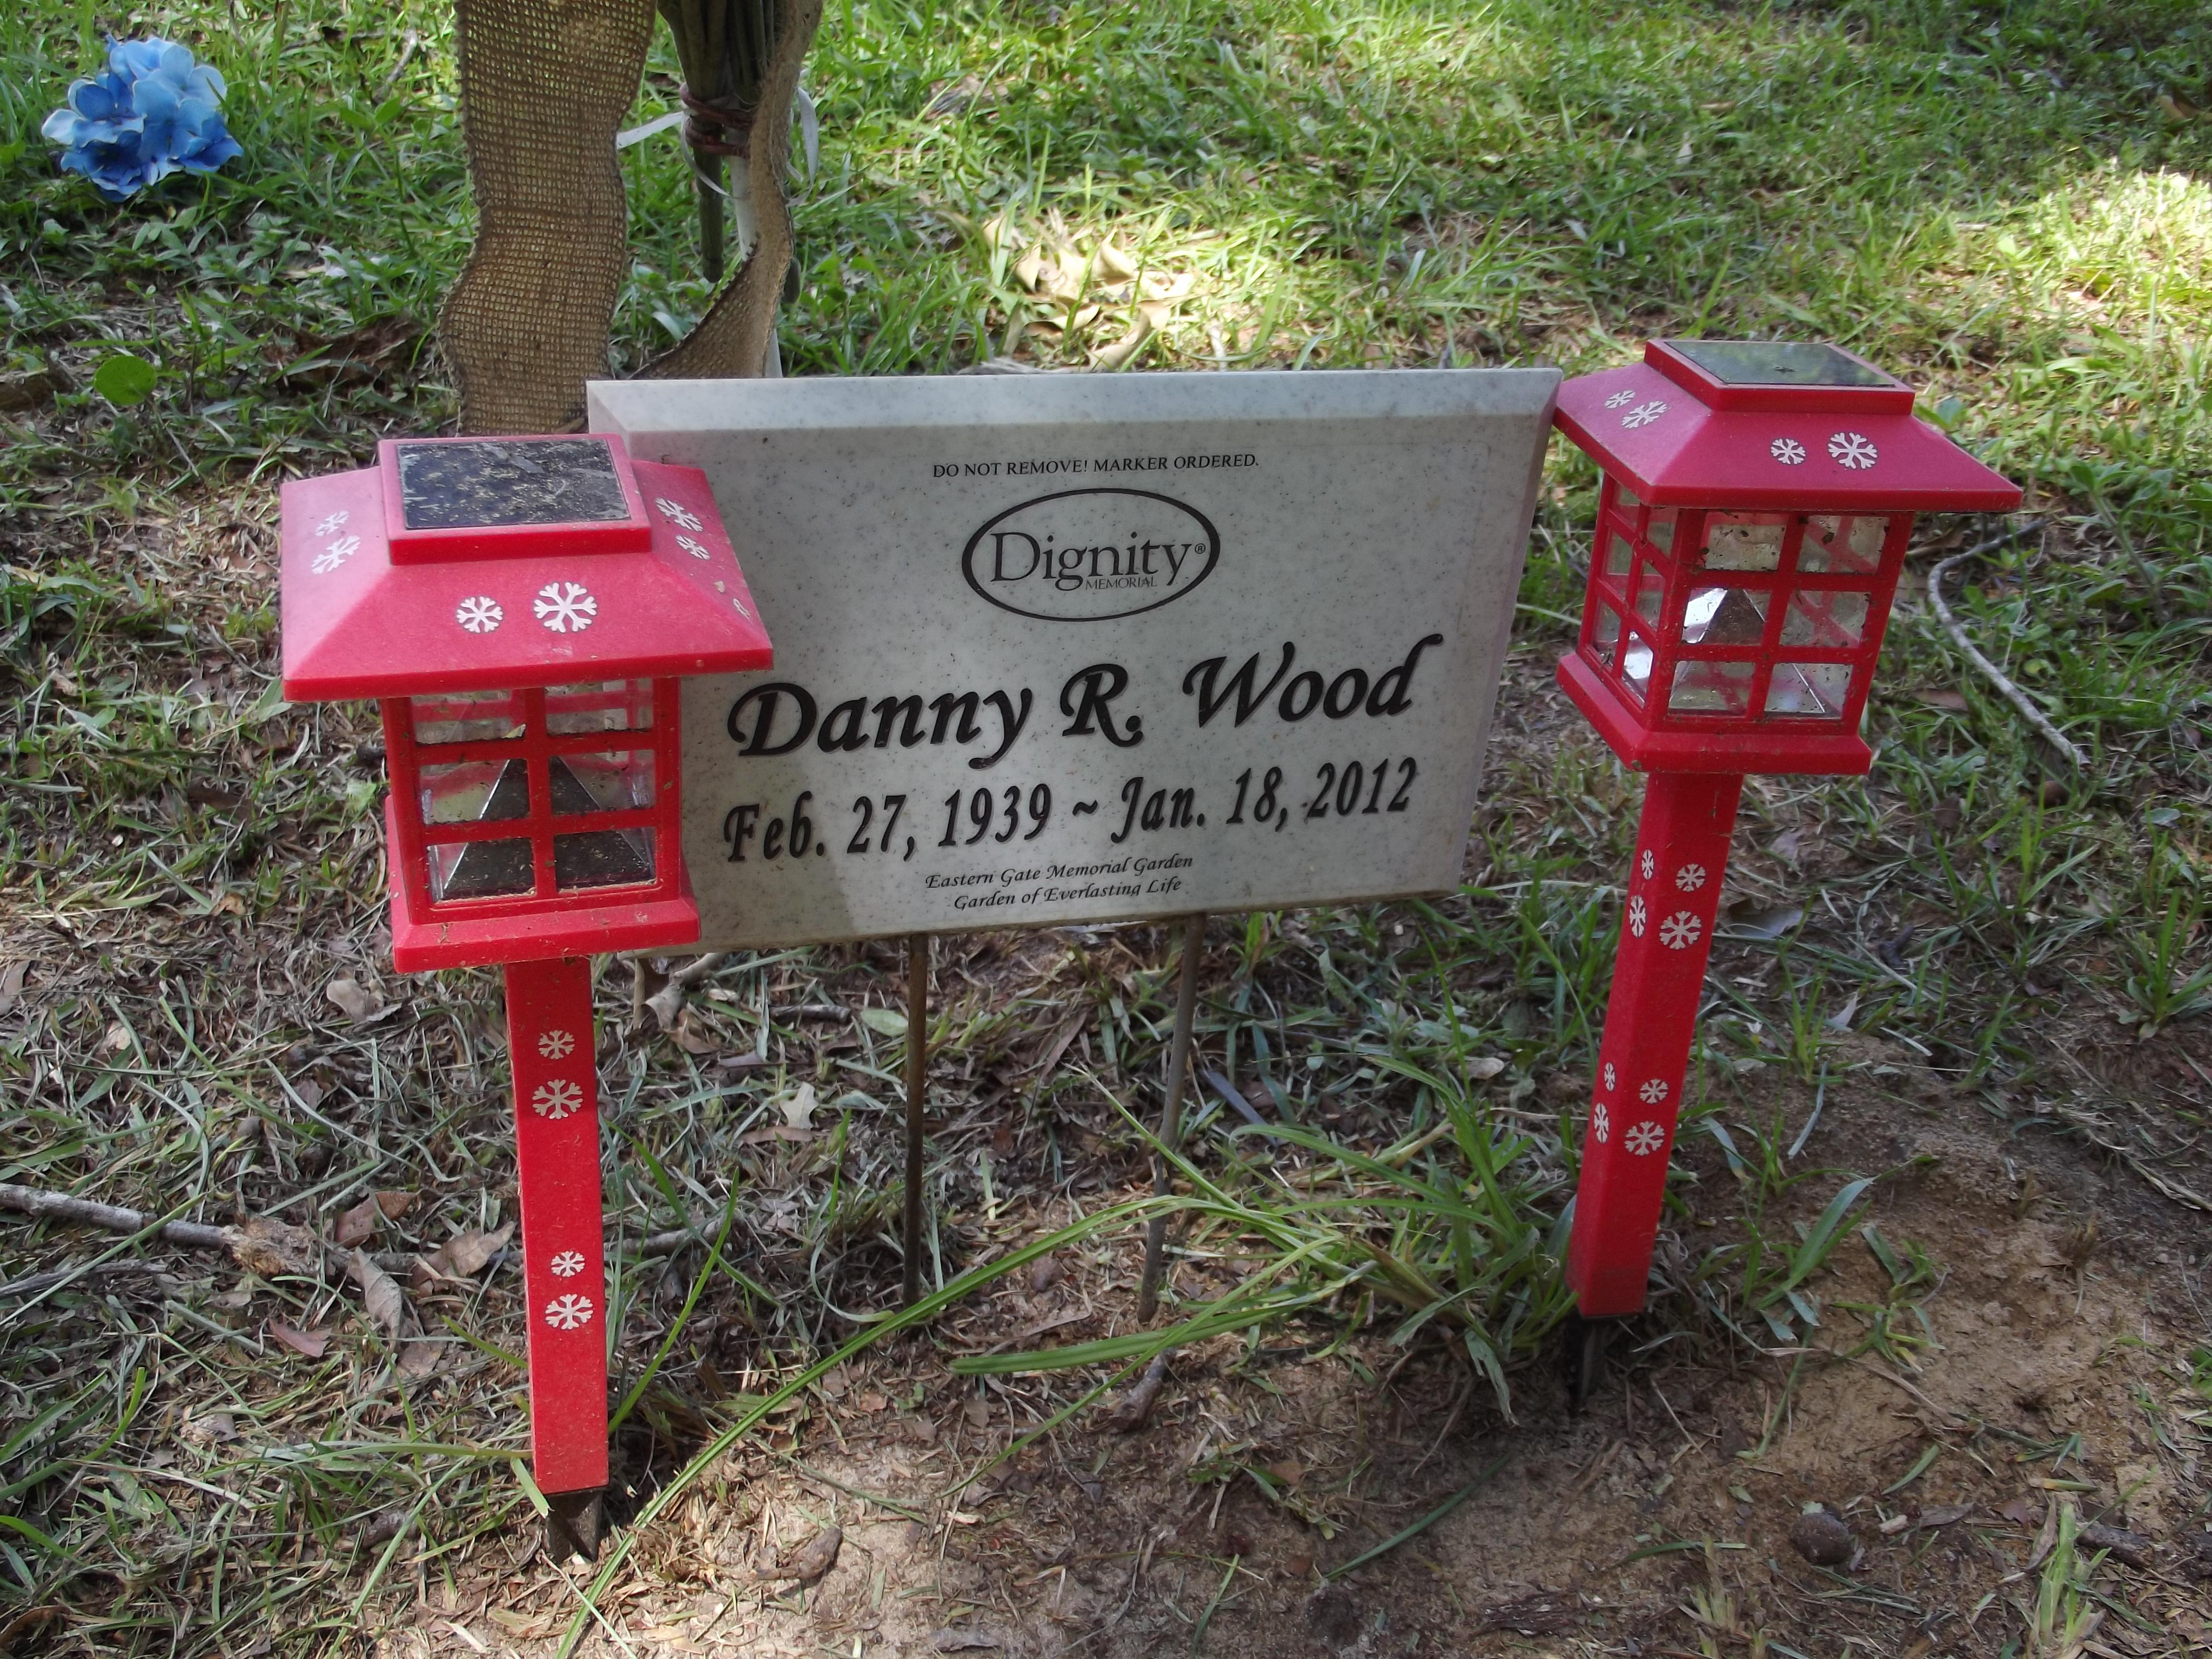 Danny R Wood